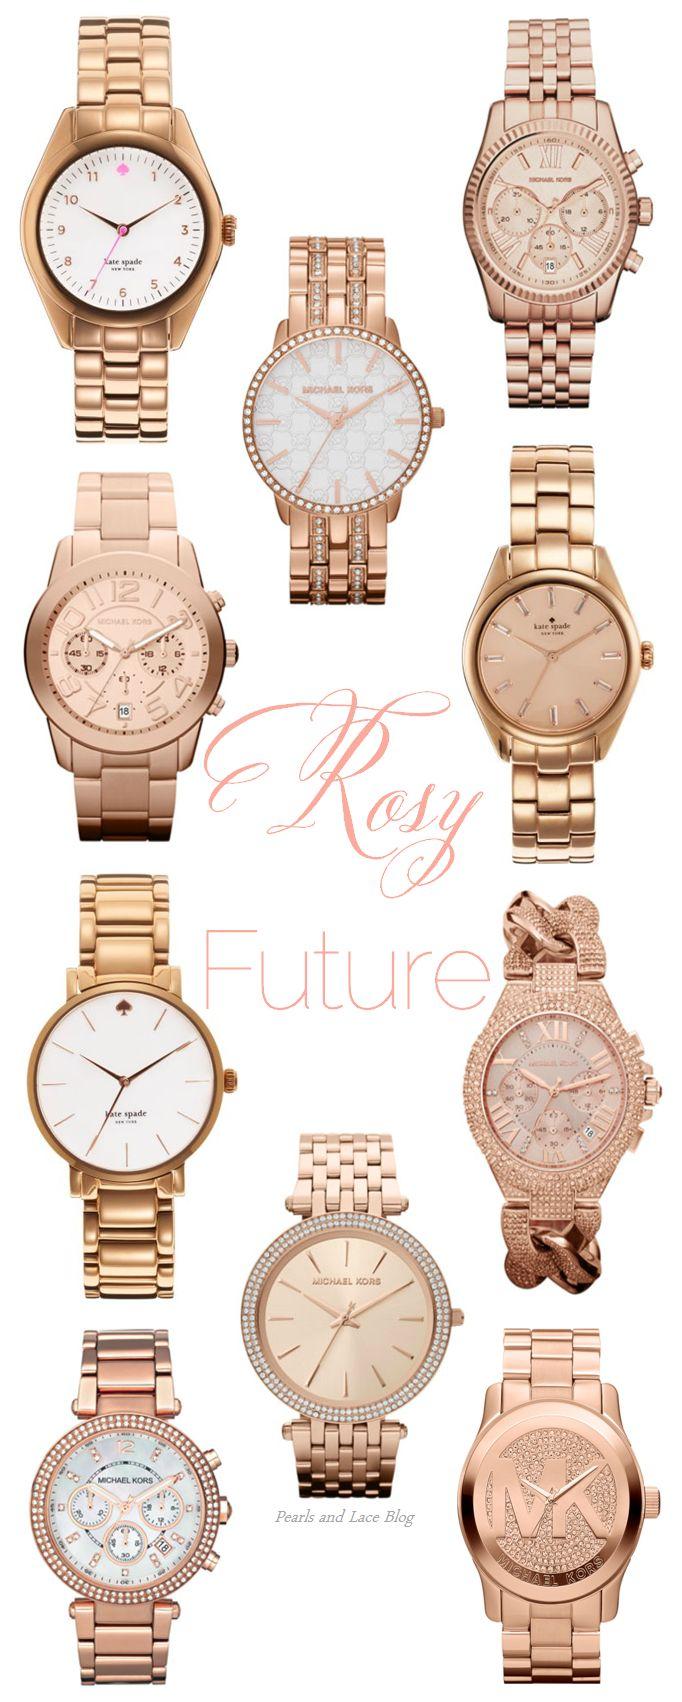 Rose Michael Kors Watches | pearlsandlaceblog.com